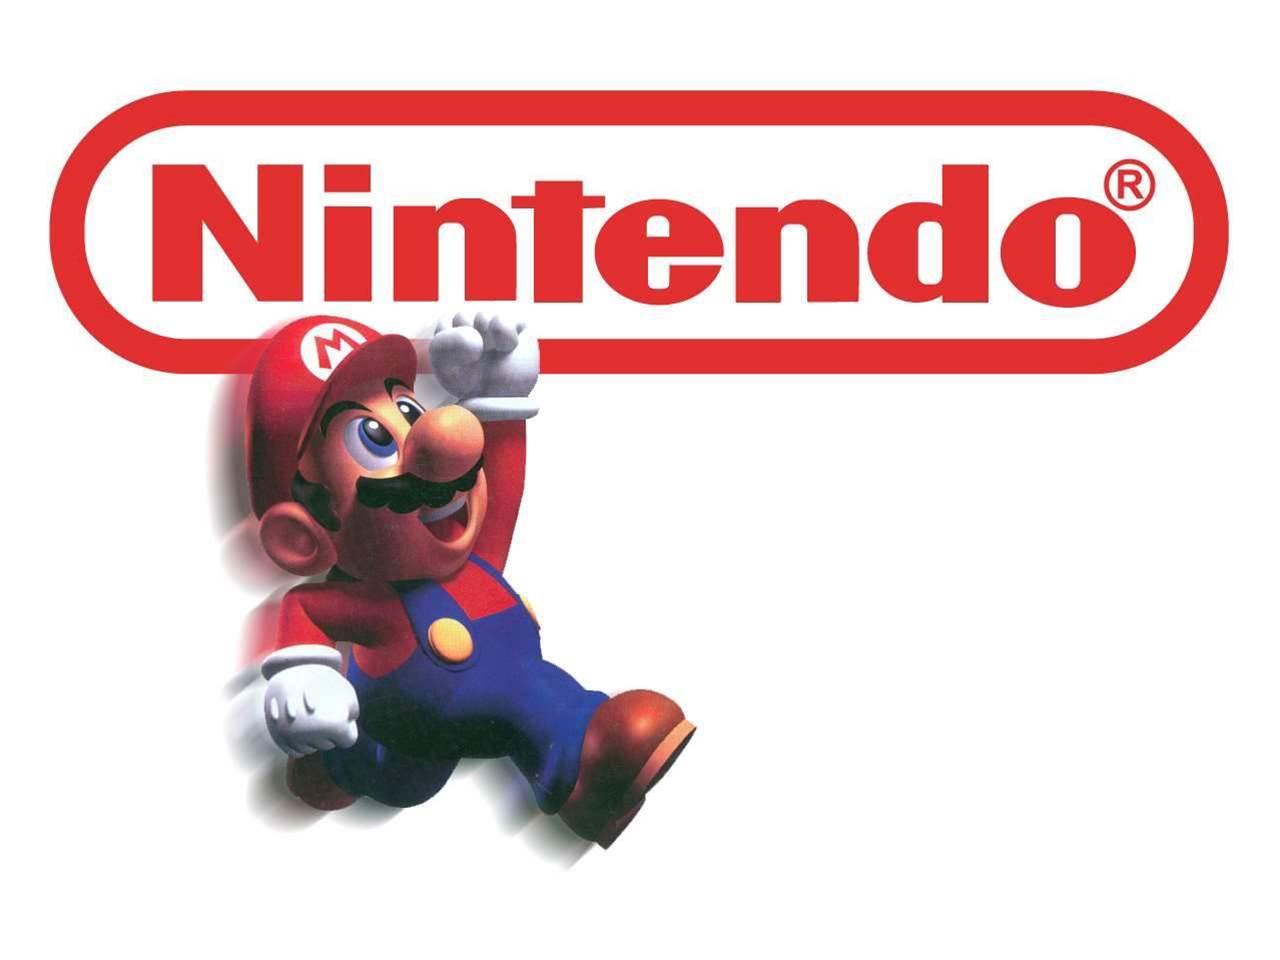 Wii U TVii cancelled